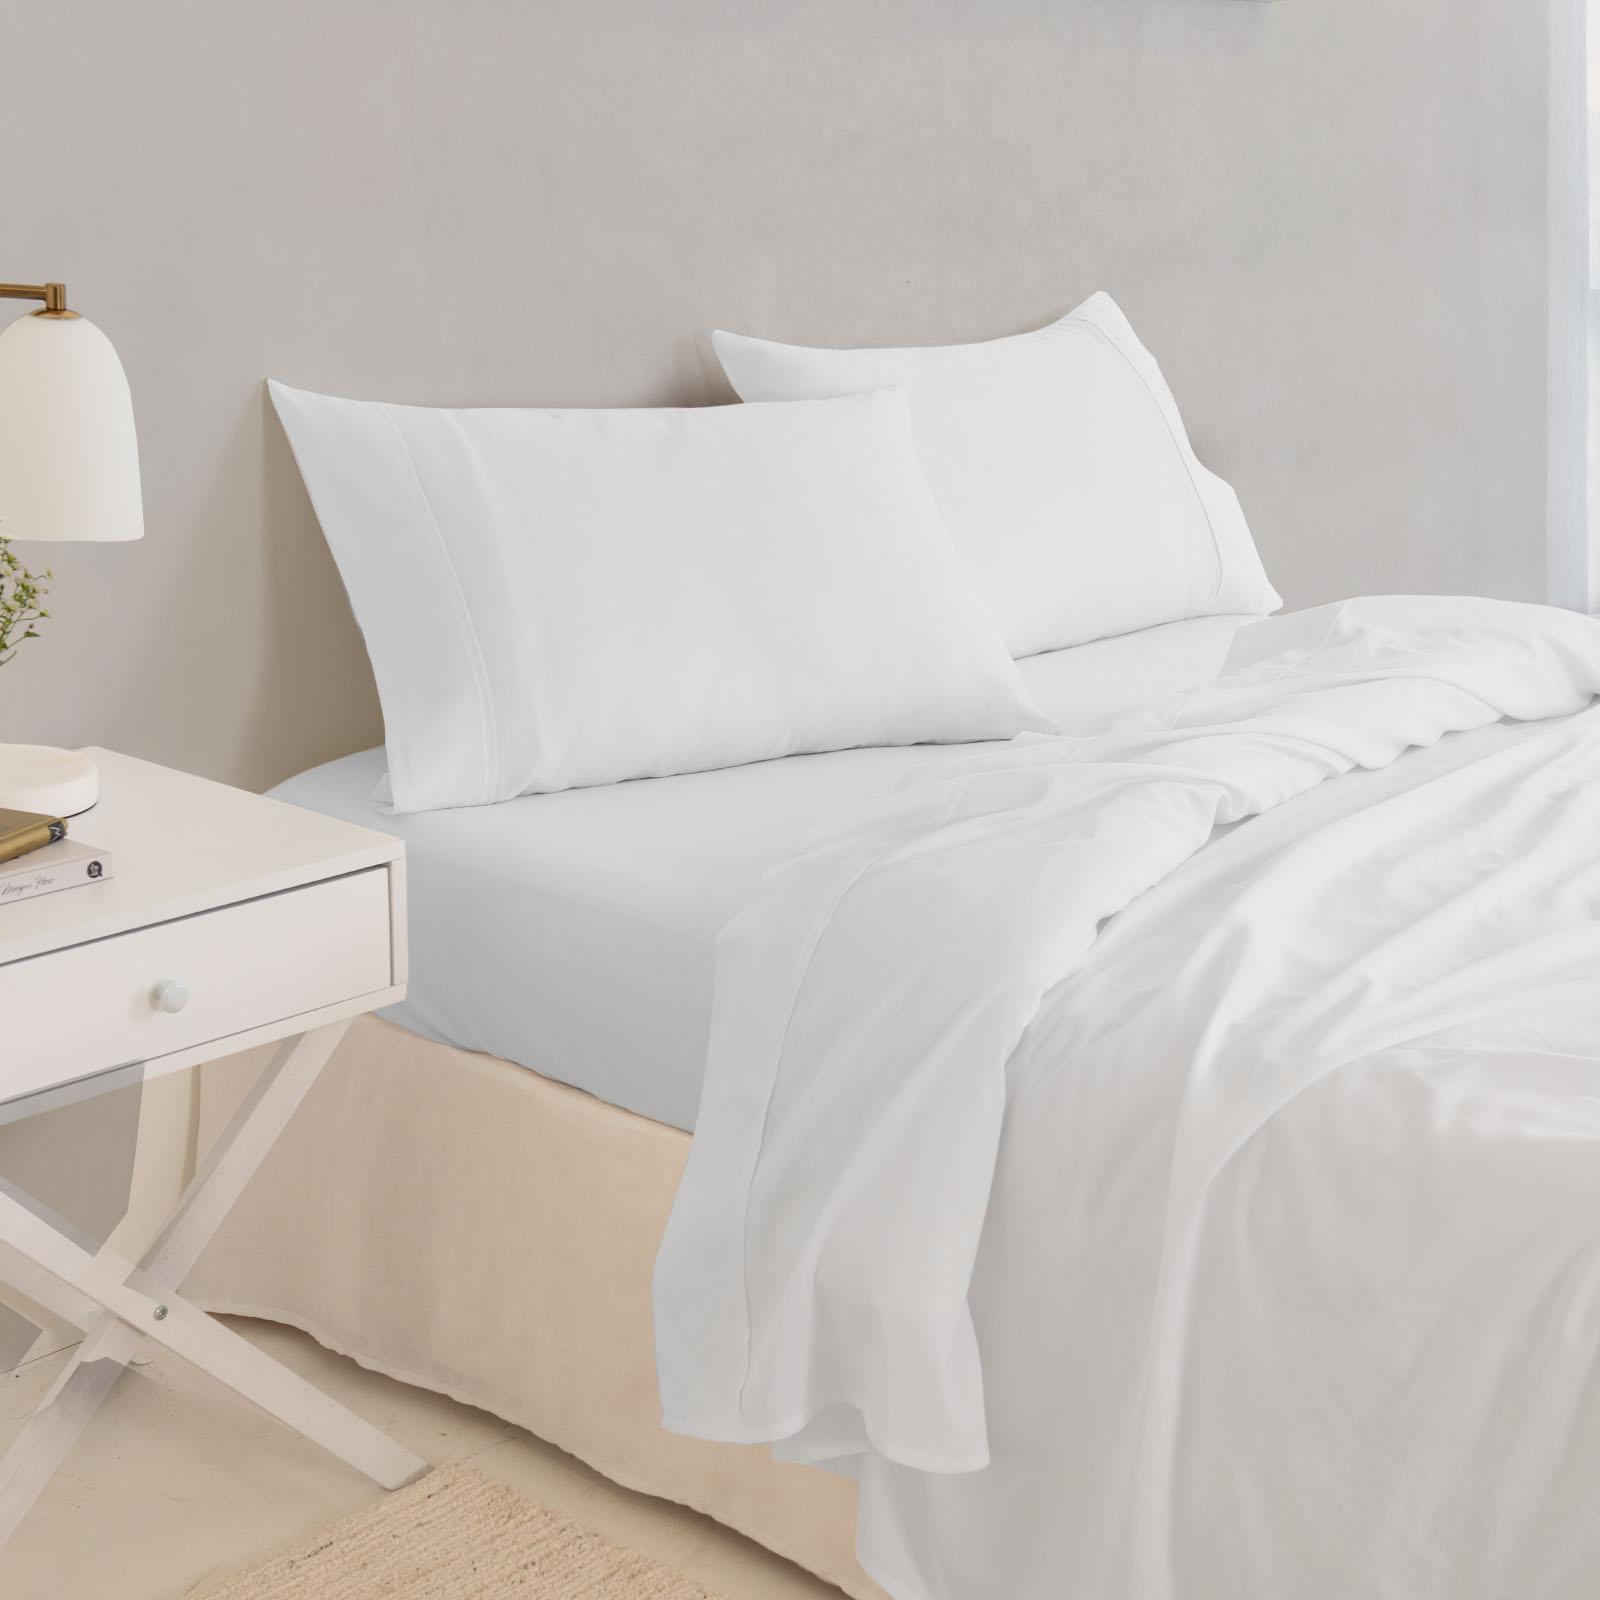 thumbnail 40 - Royal Comfort 1000TC Hotel Grade Bamboo Cotton Sheets Pillowcases Set Ultrasoft